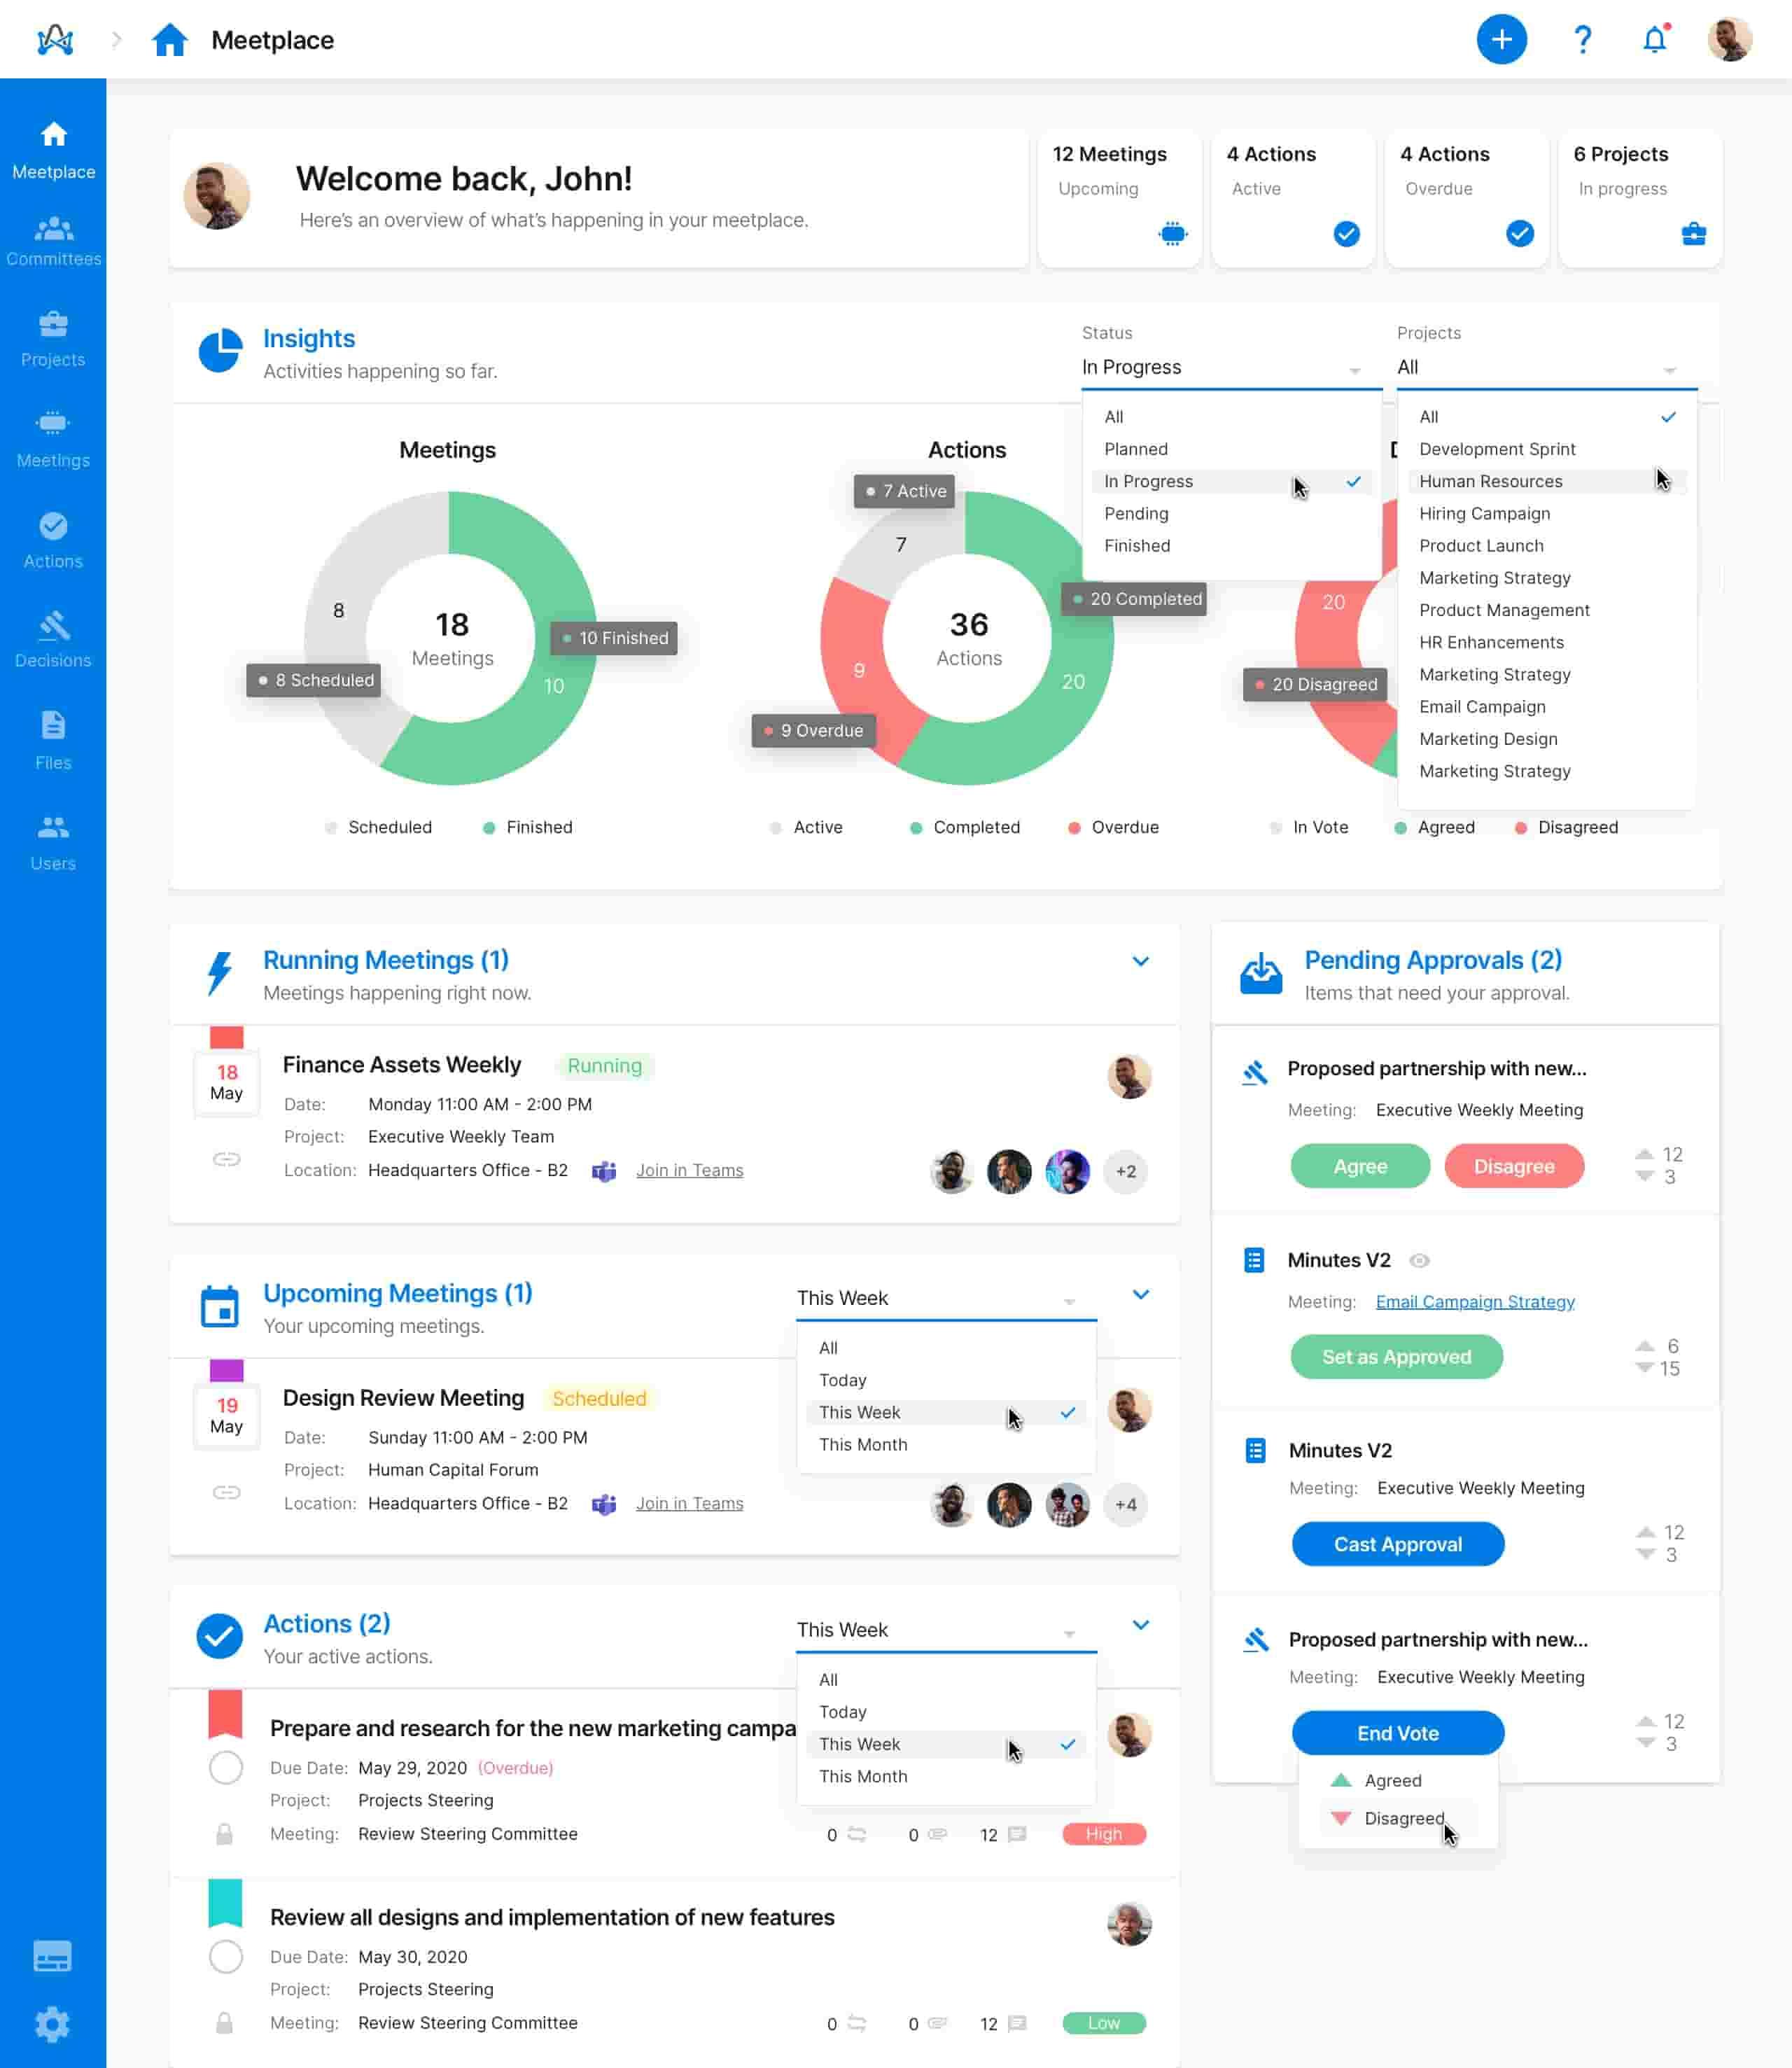 Screenshot from adam.ai - Meetplace dashboard